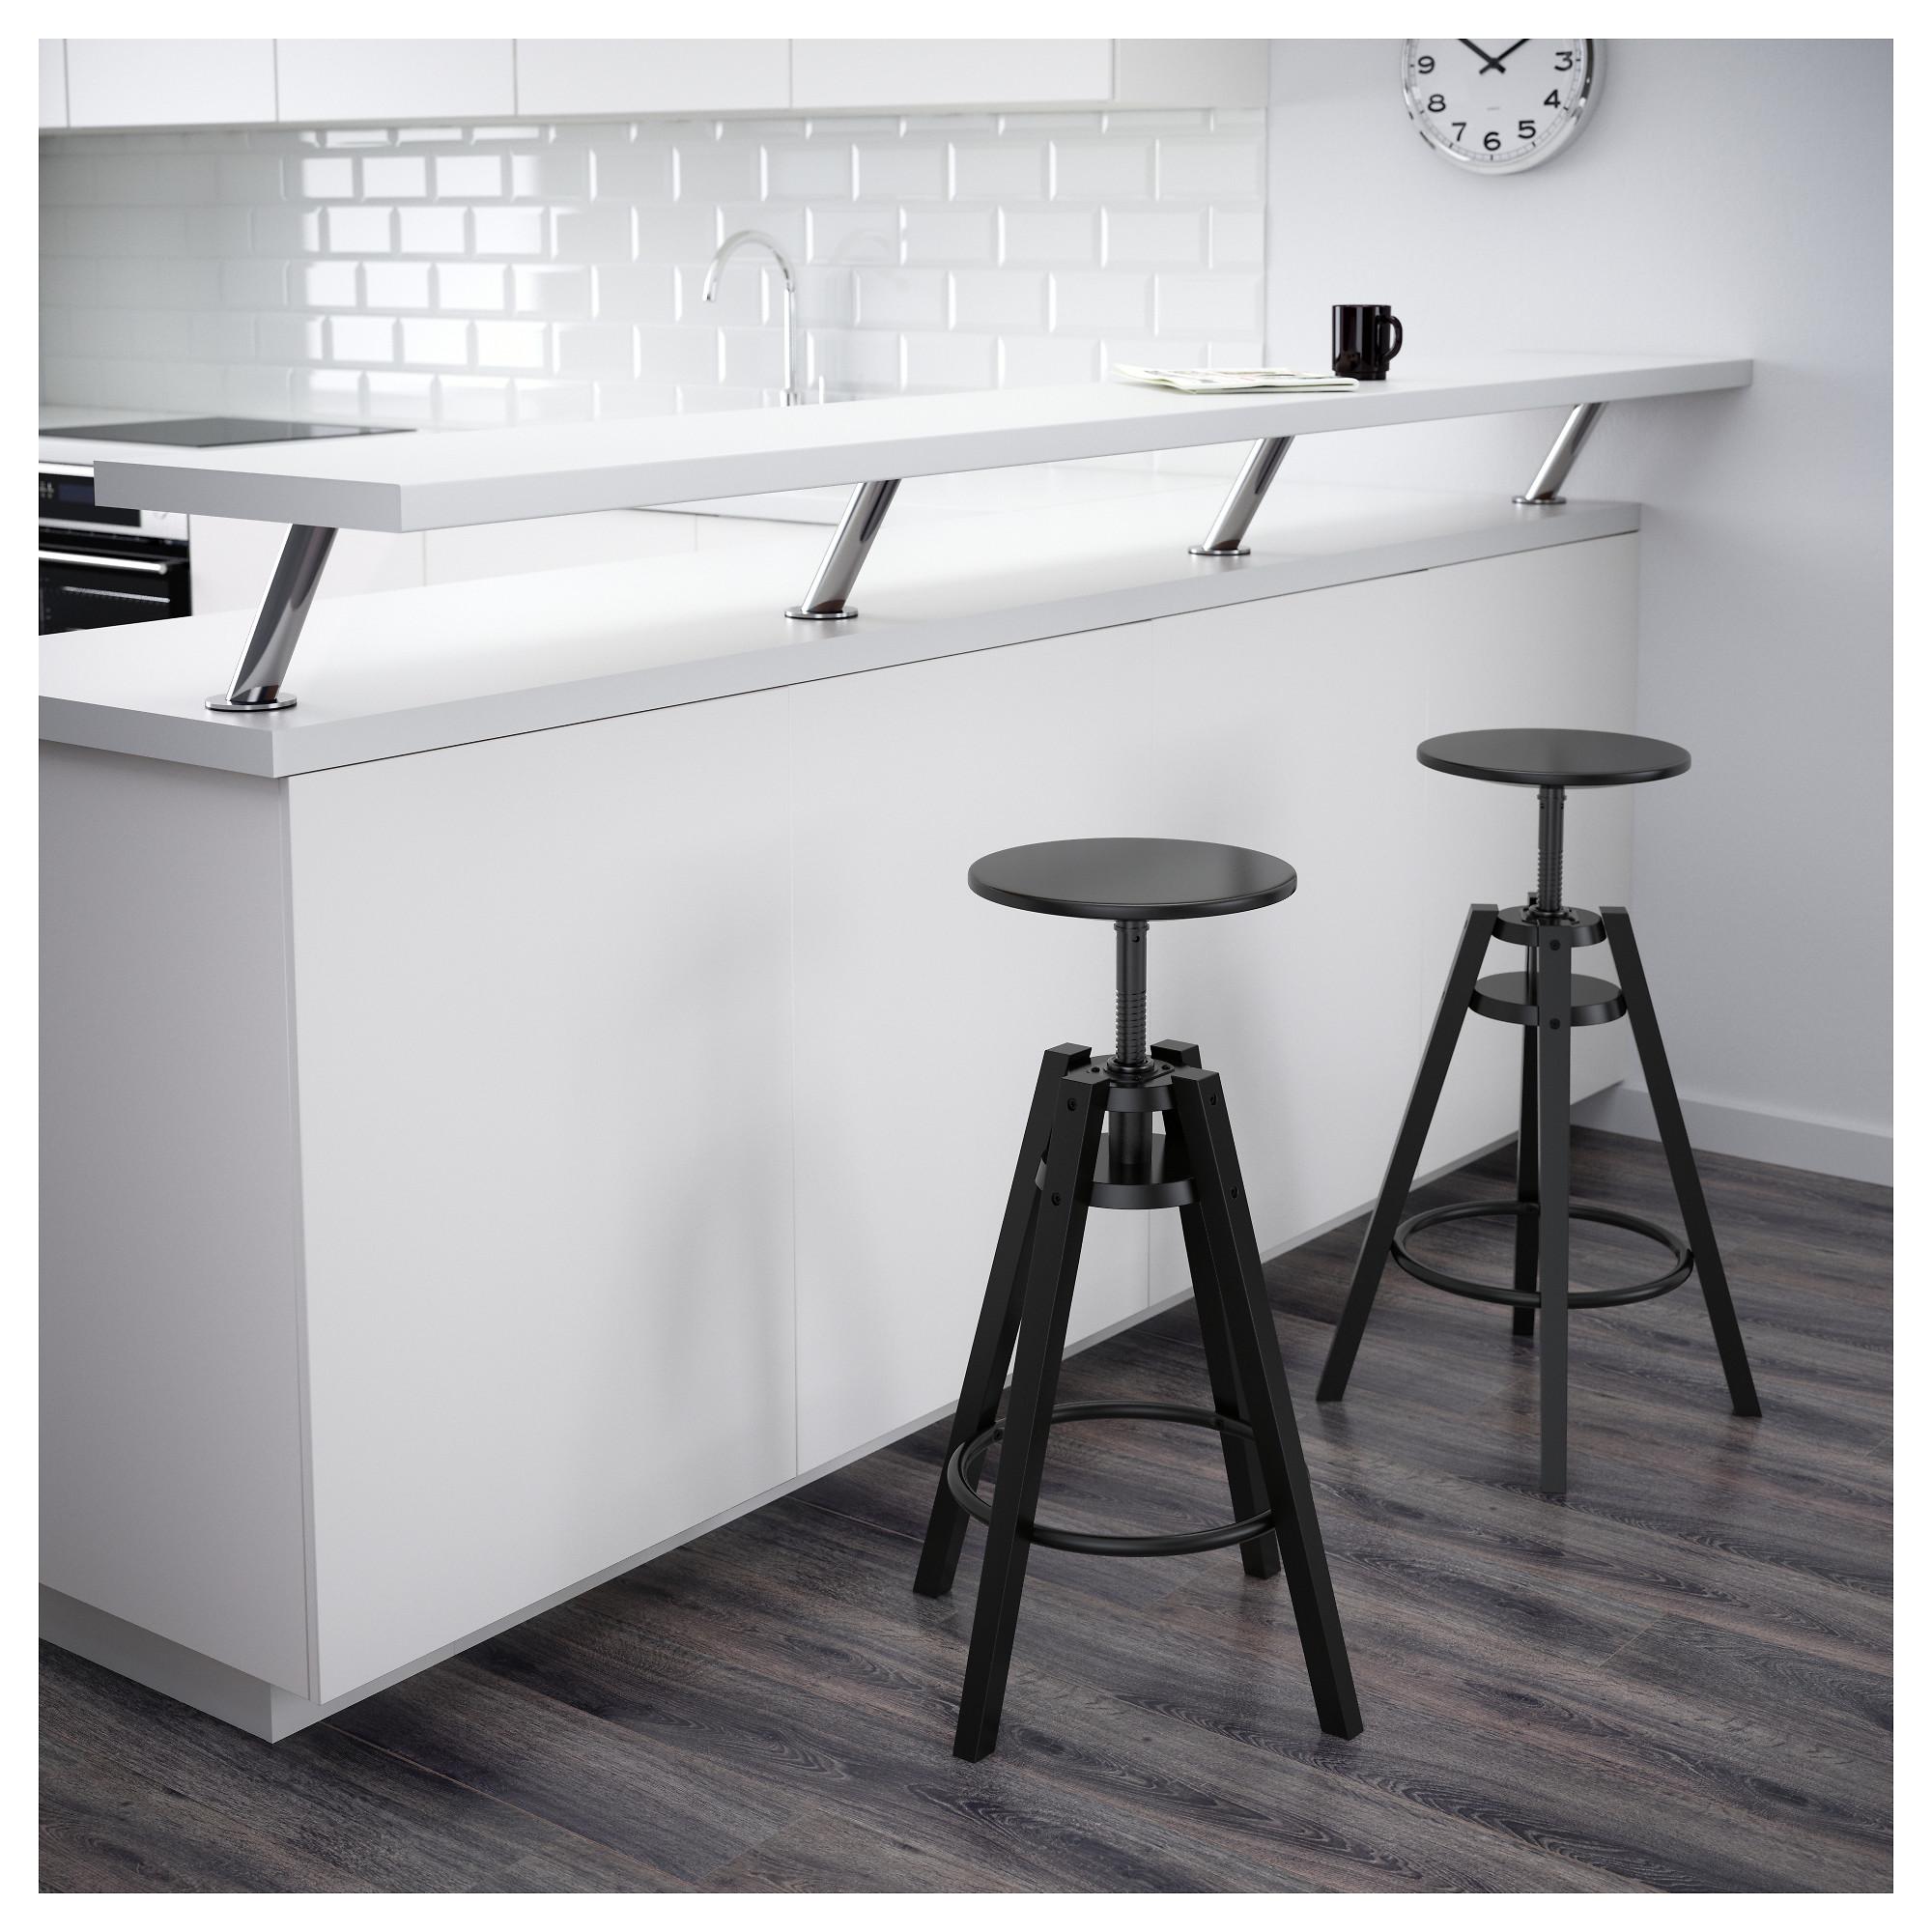 Phenomenal Dalfred Bar Stool Black Ikea Hong Kong Machost Co Dining Chair Design Ideas Machostcouk